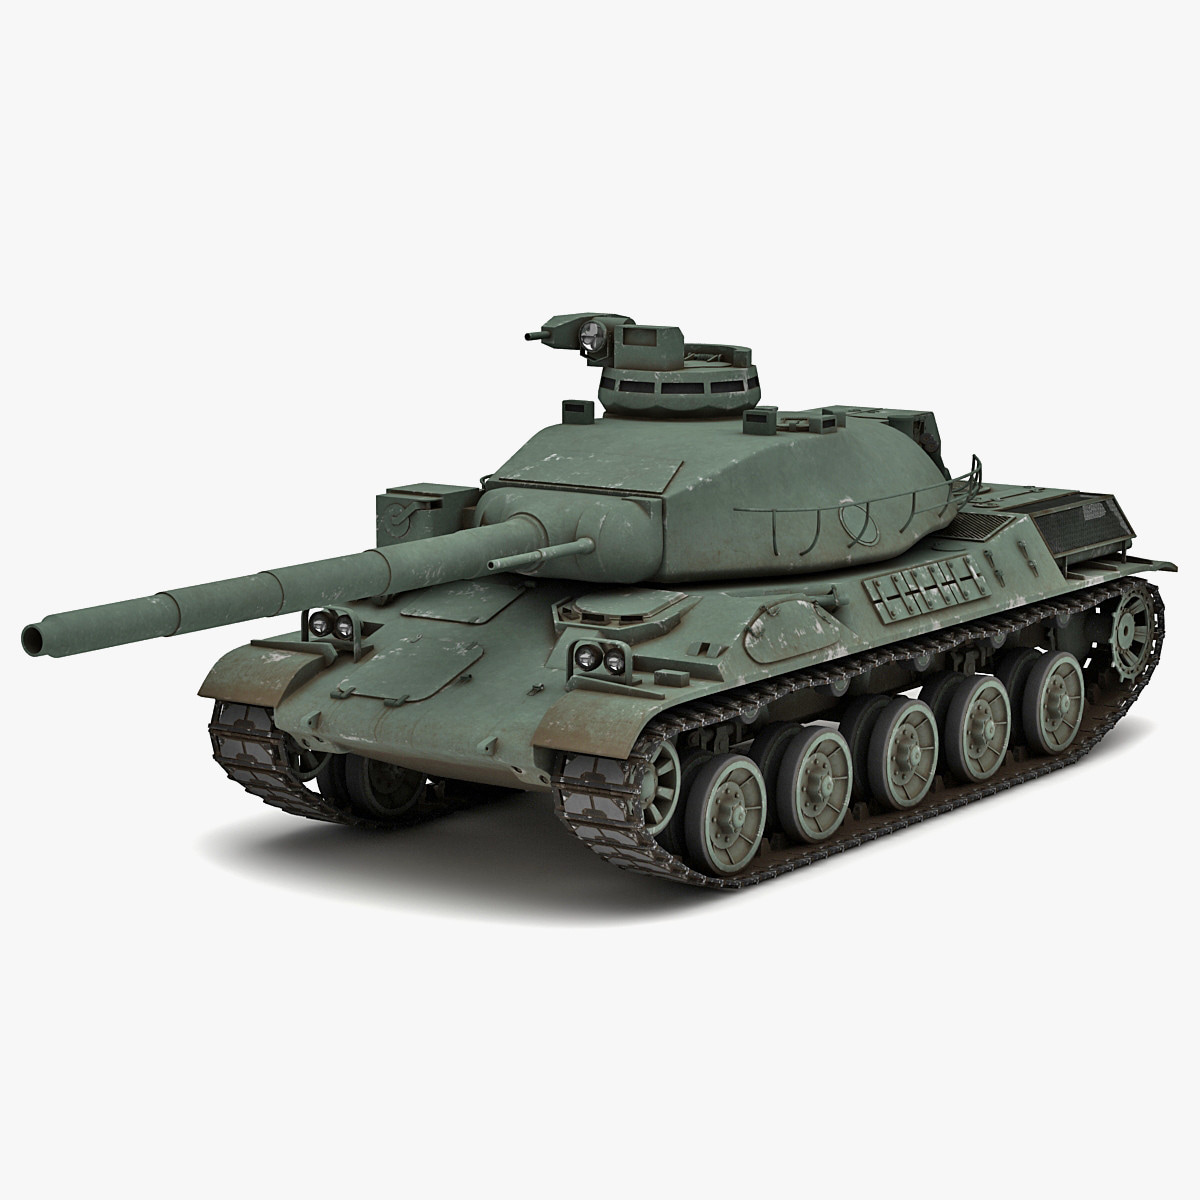 max amx-32 france main battle tank